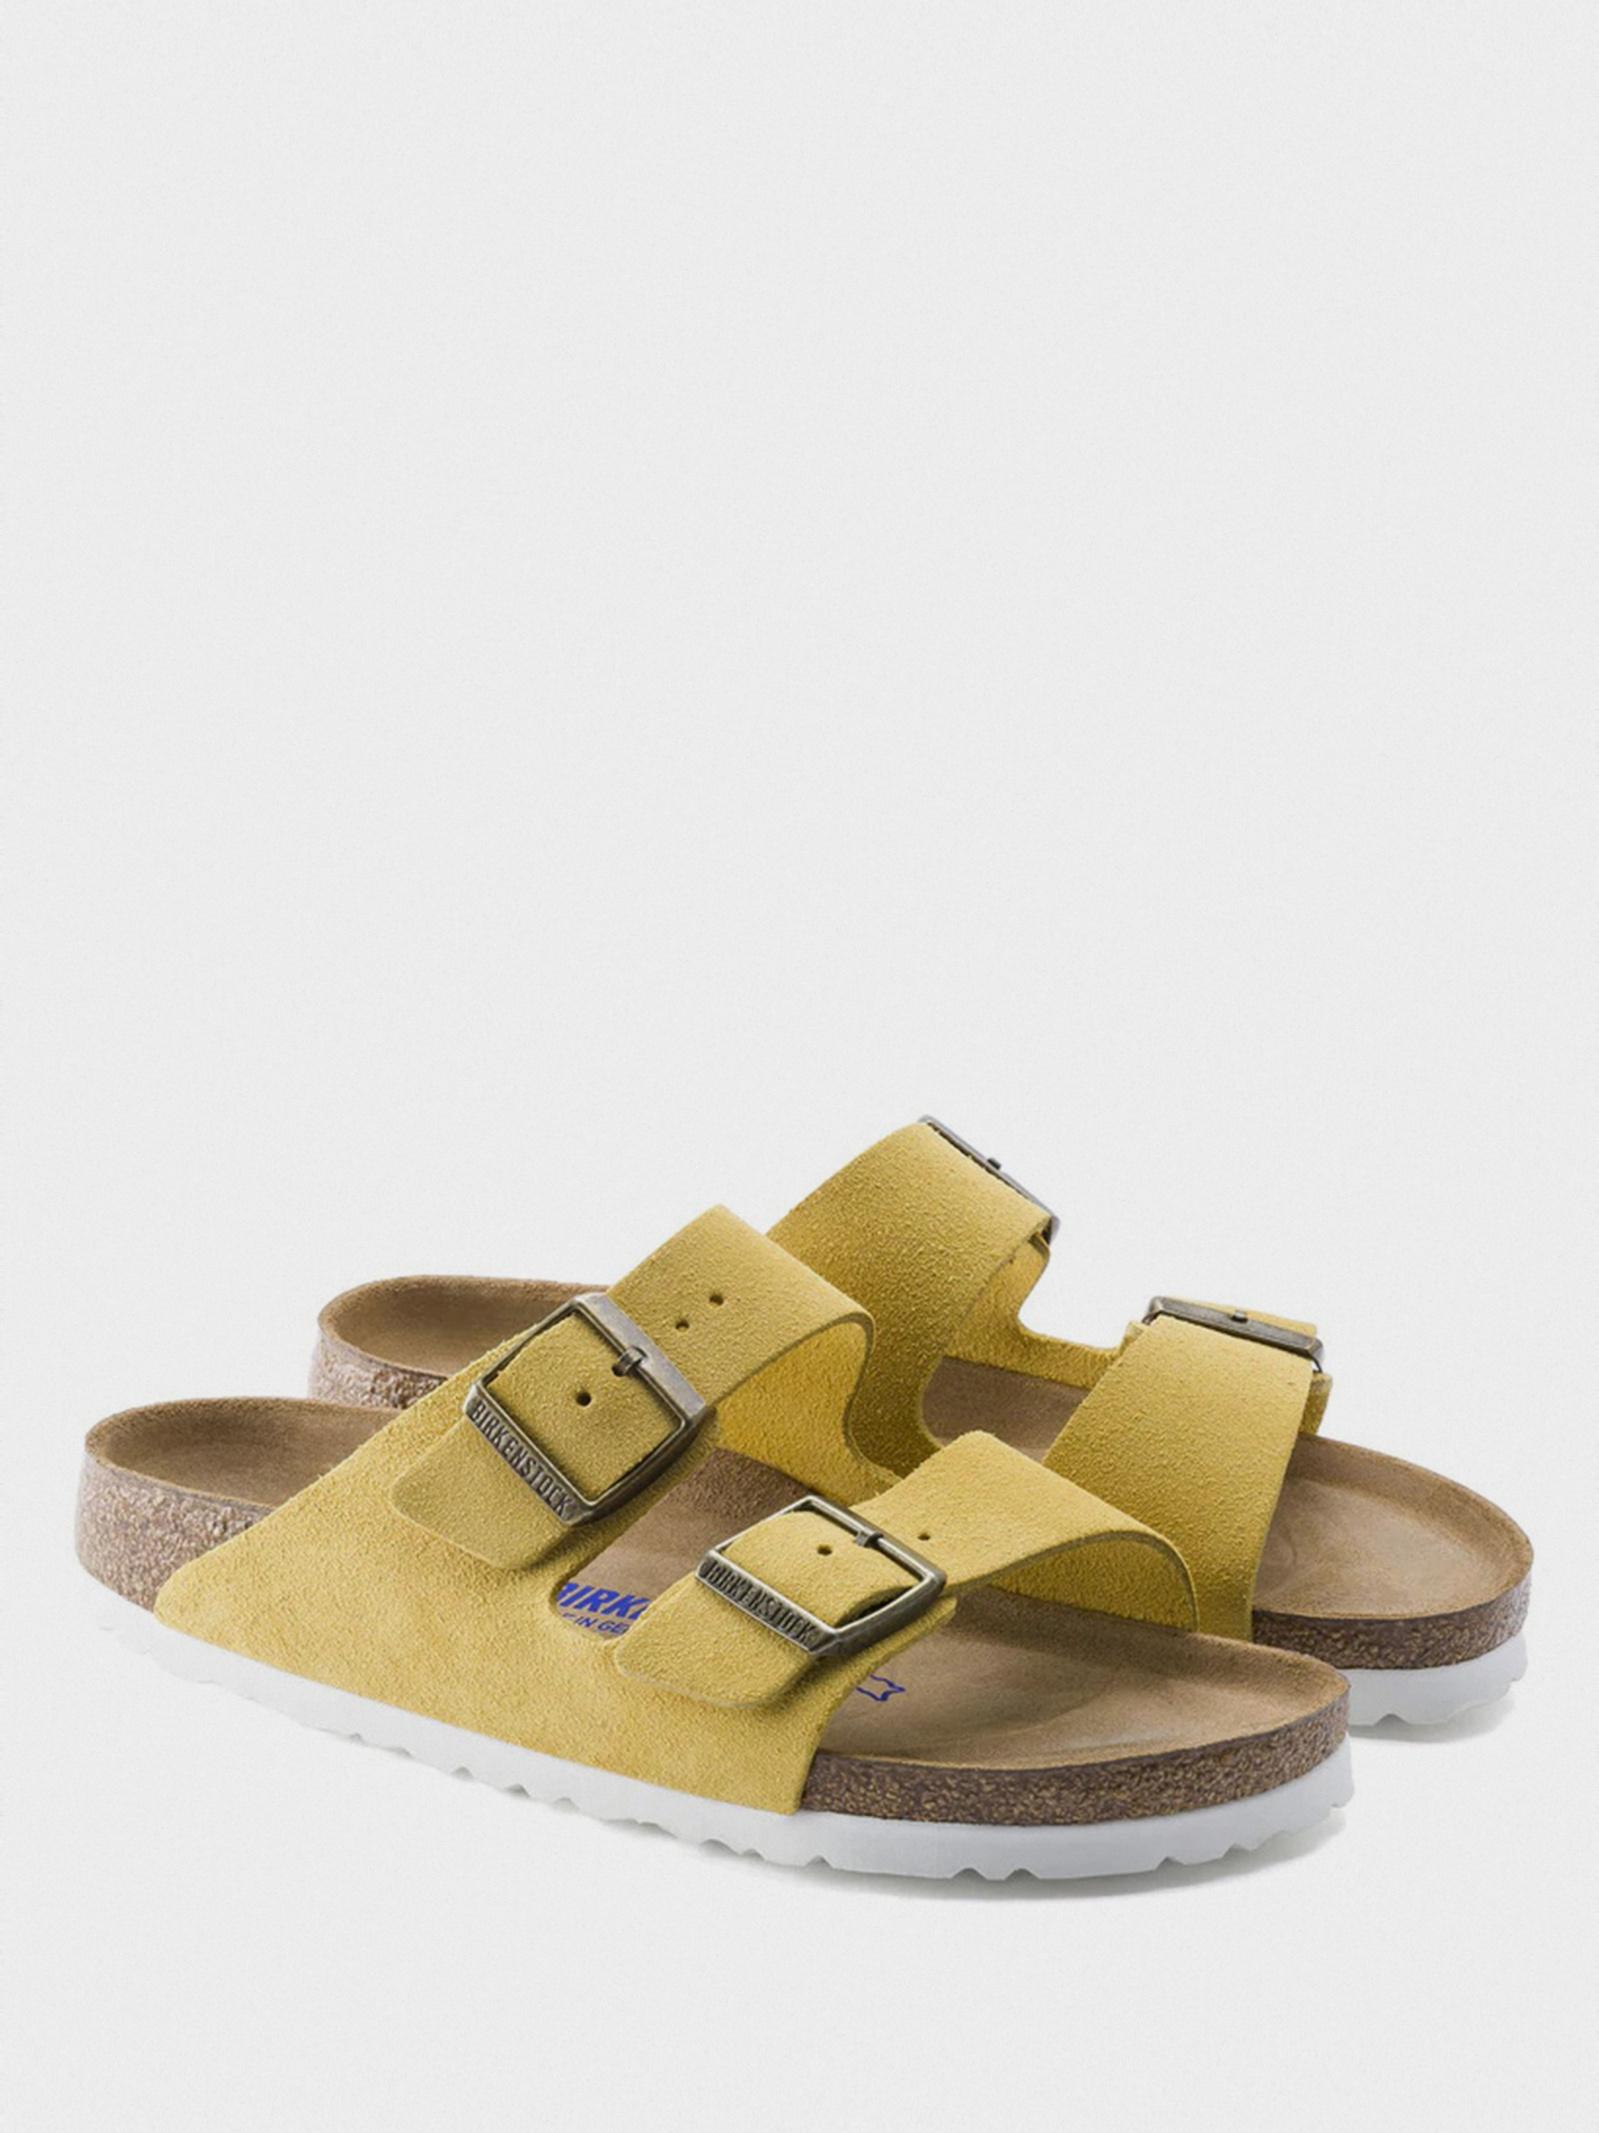 Шльопанці  жіночі Birkenstock Arizona SFB VL Ochre R 1015889 брендове взуття, 2017